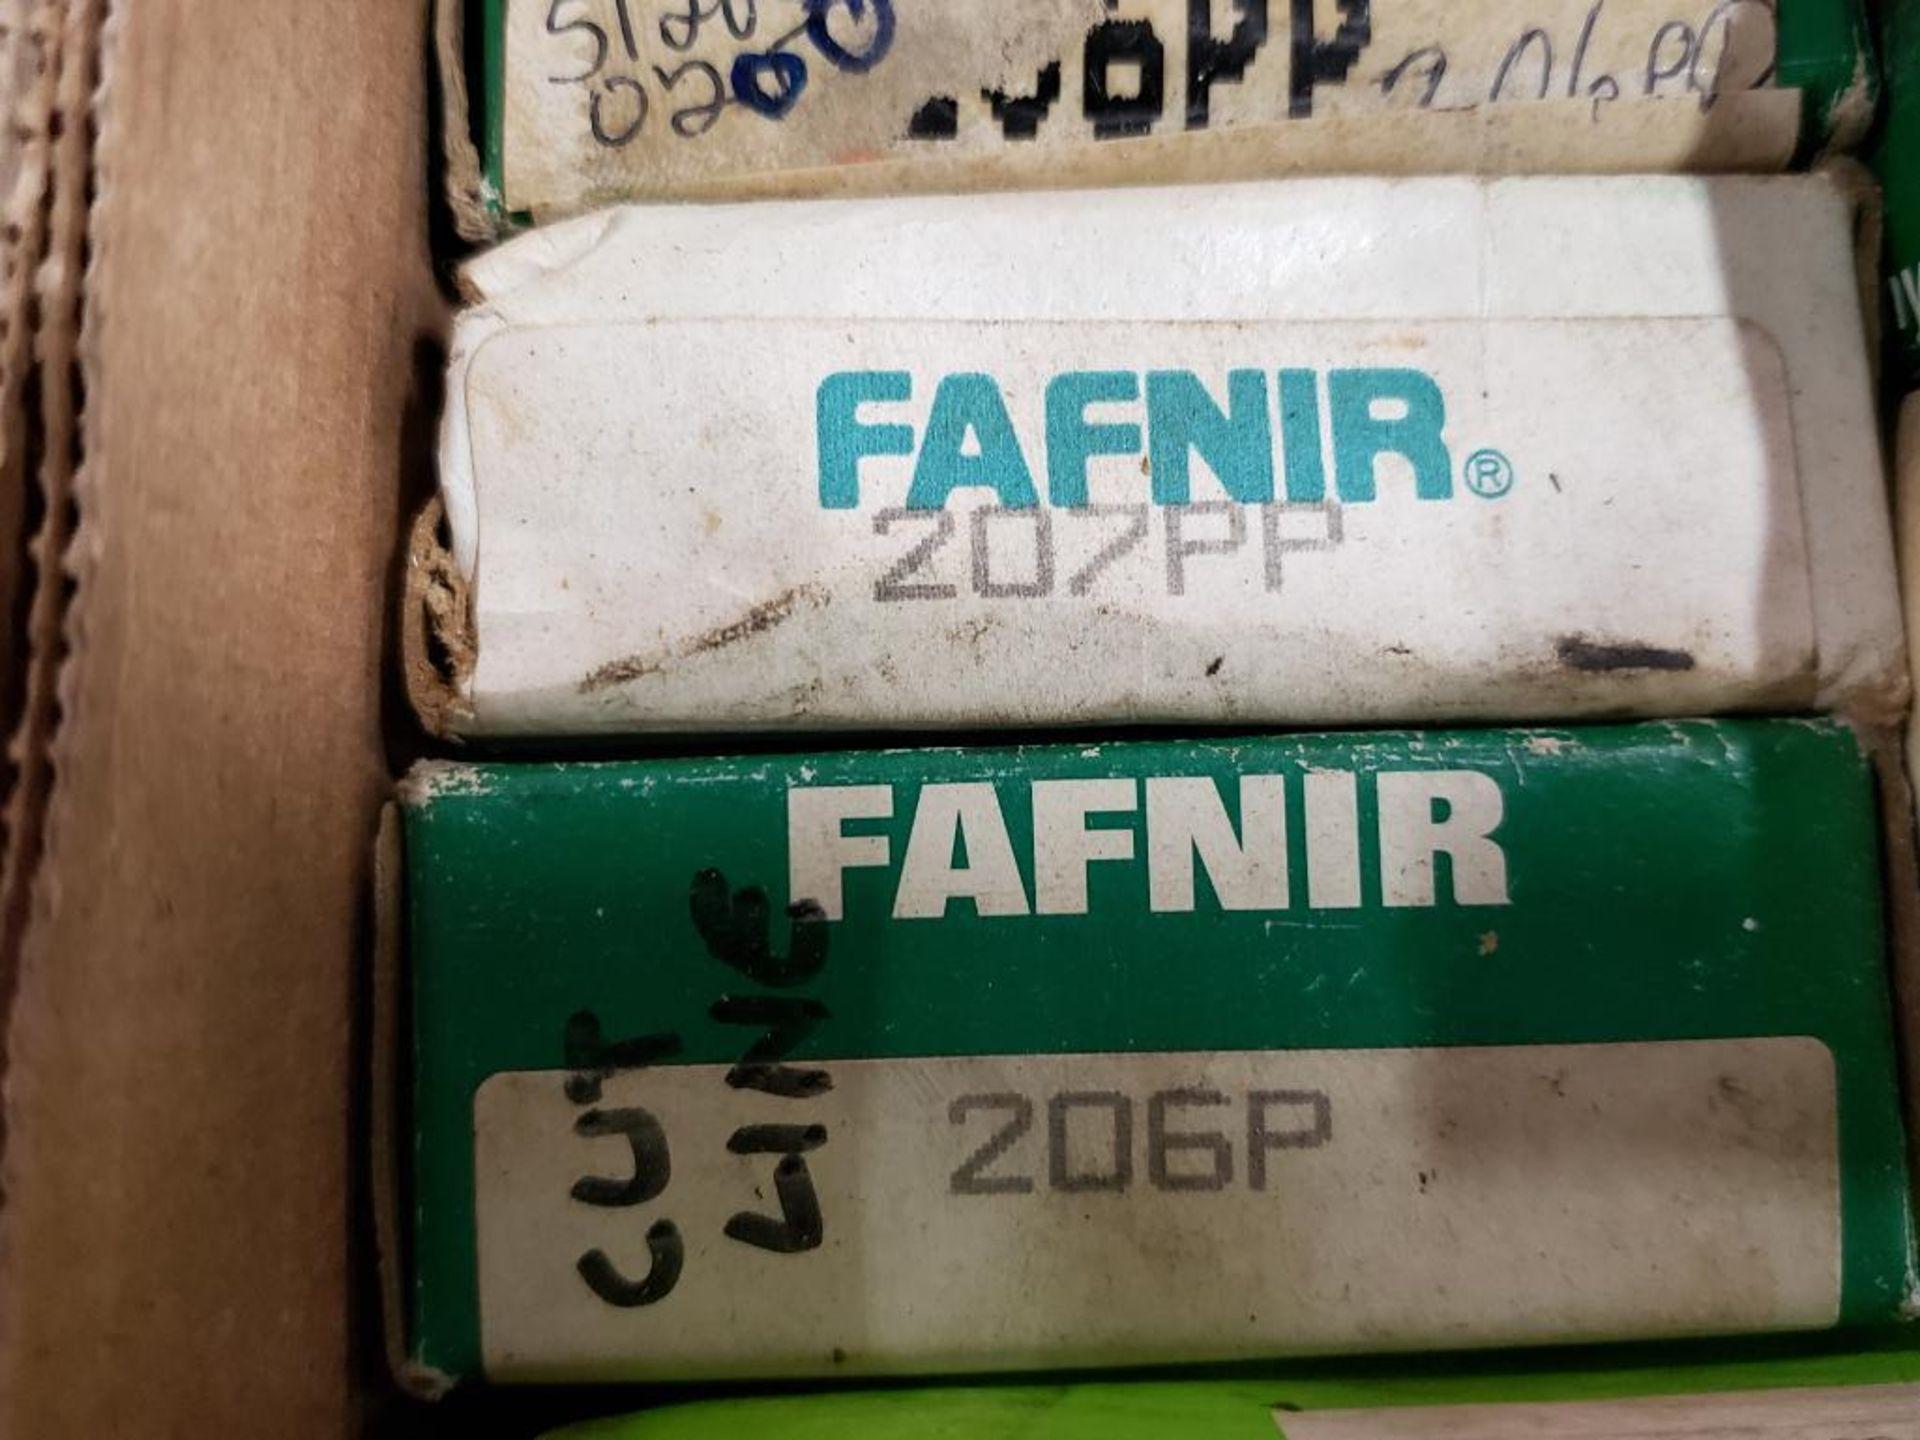 Assorted bearings. INA, Fafnir. - Image 3 of 14